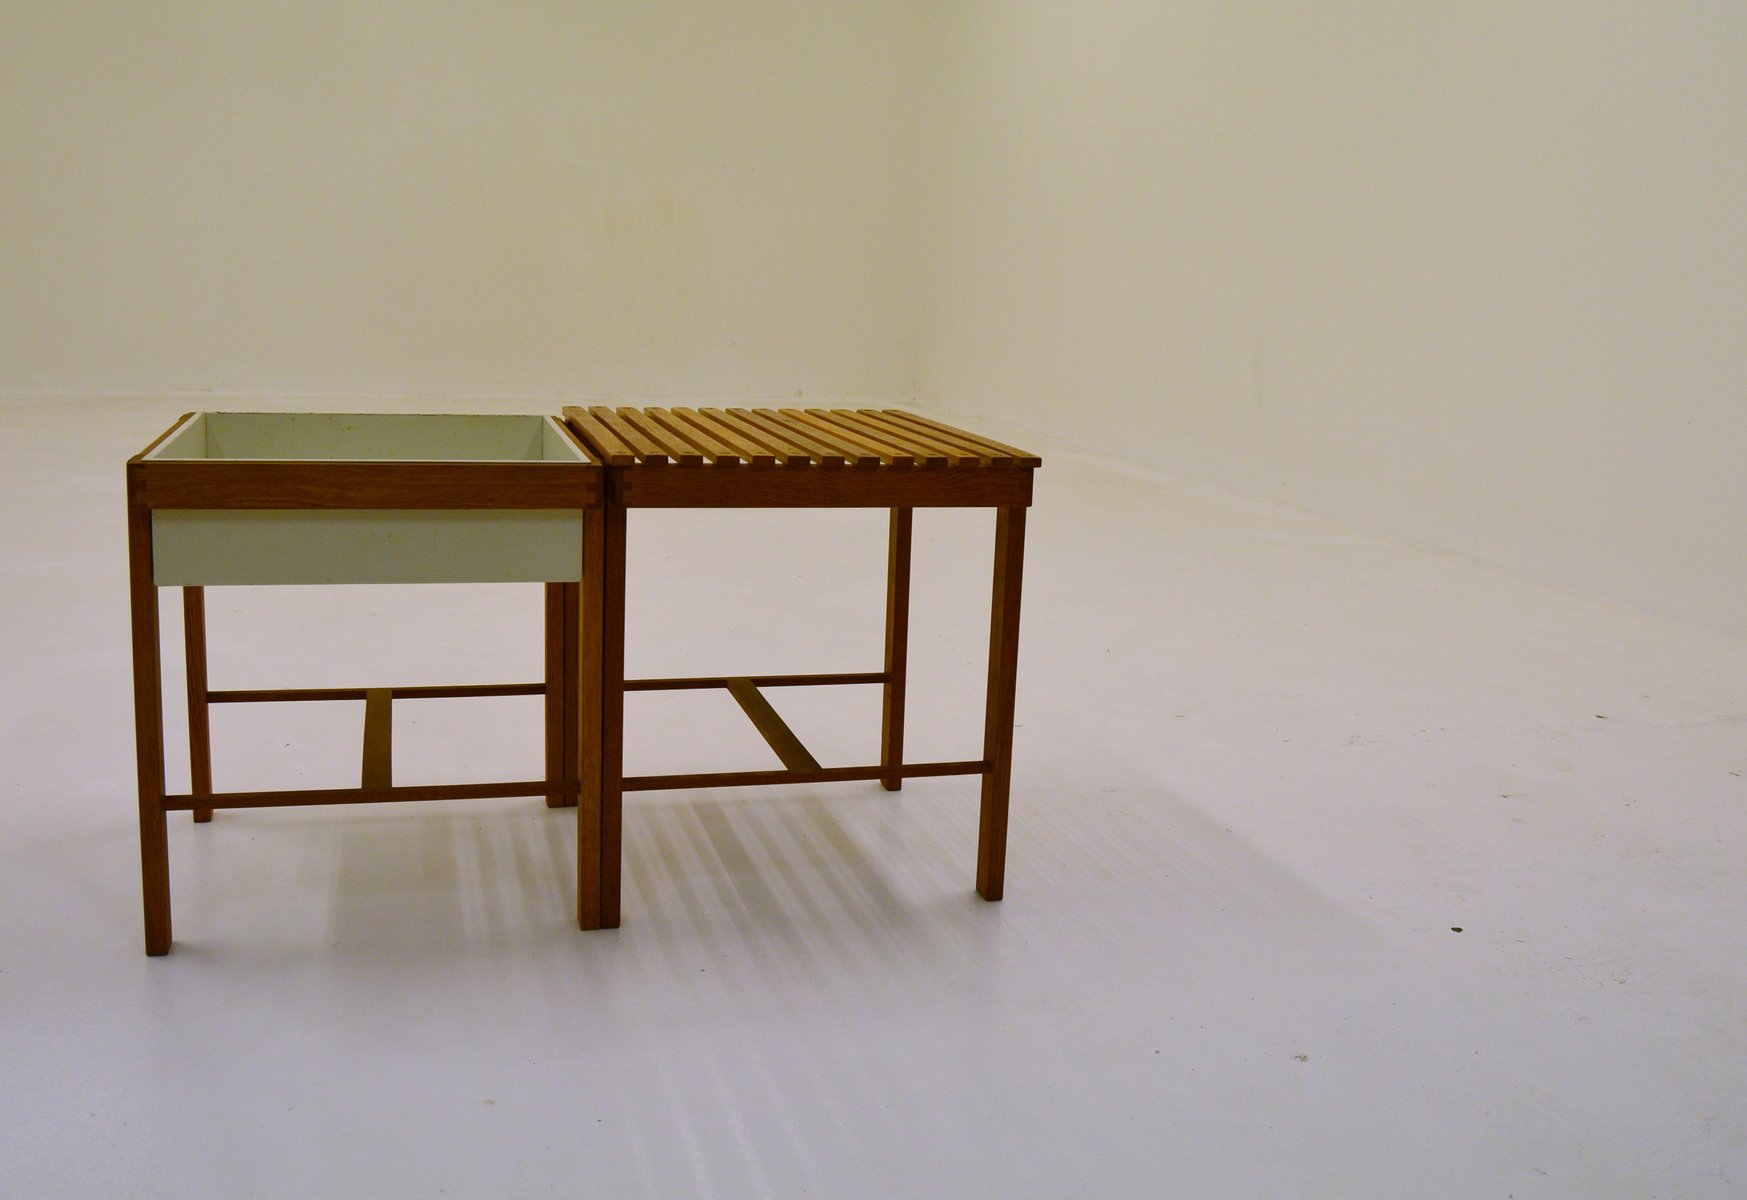 oak side table. Oak Side Table And Planter, 1950s